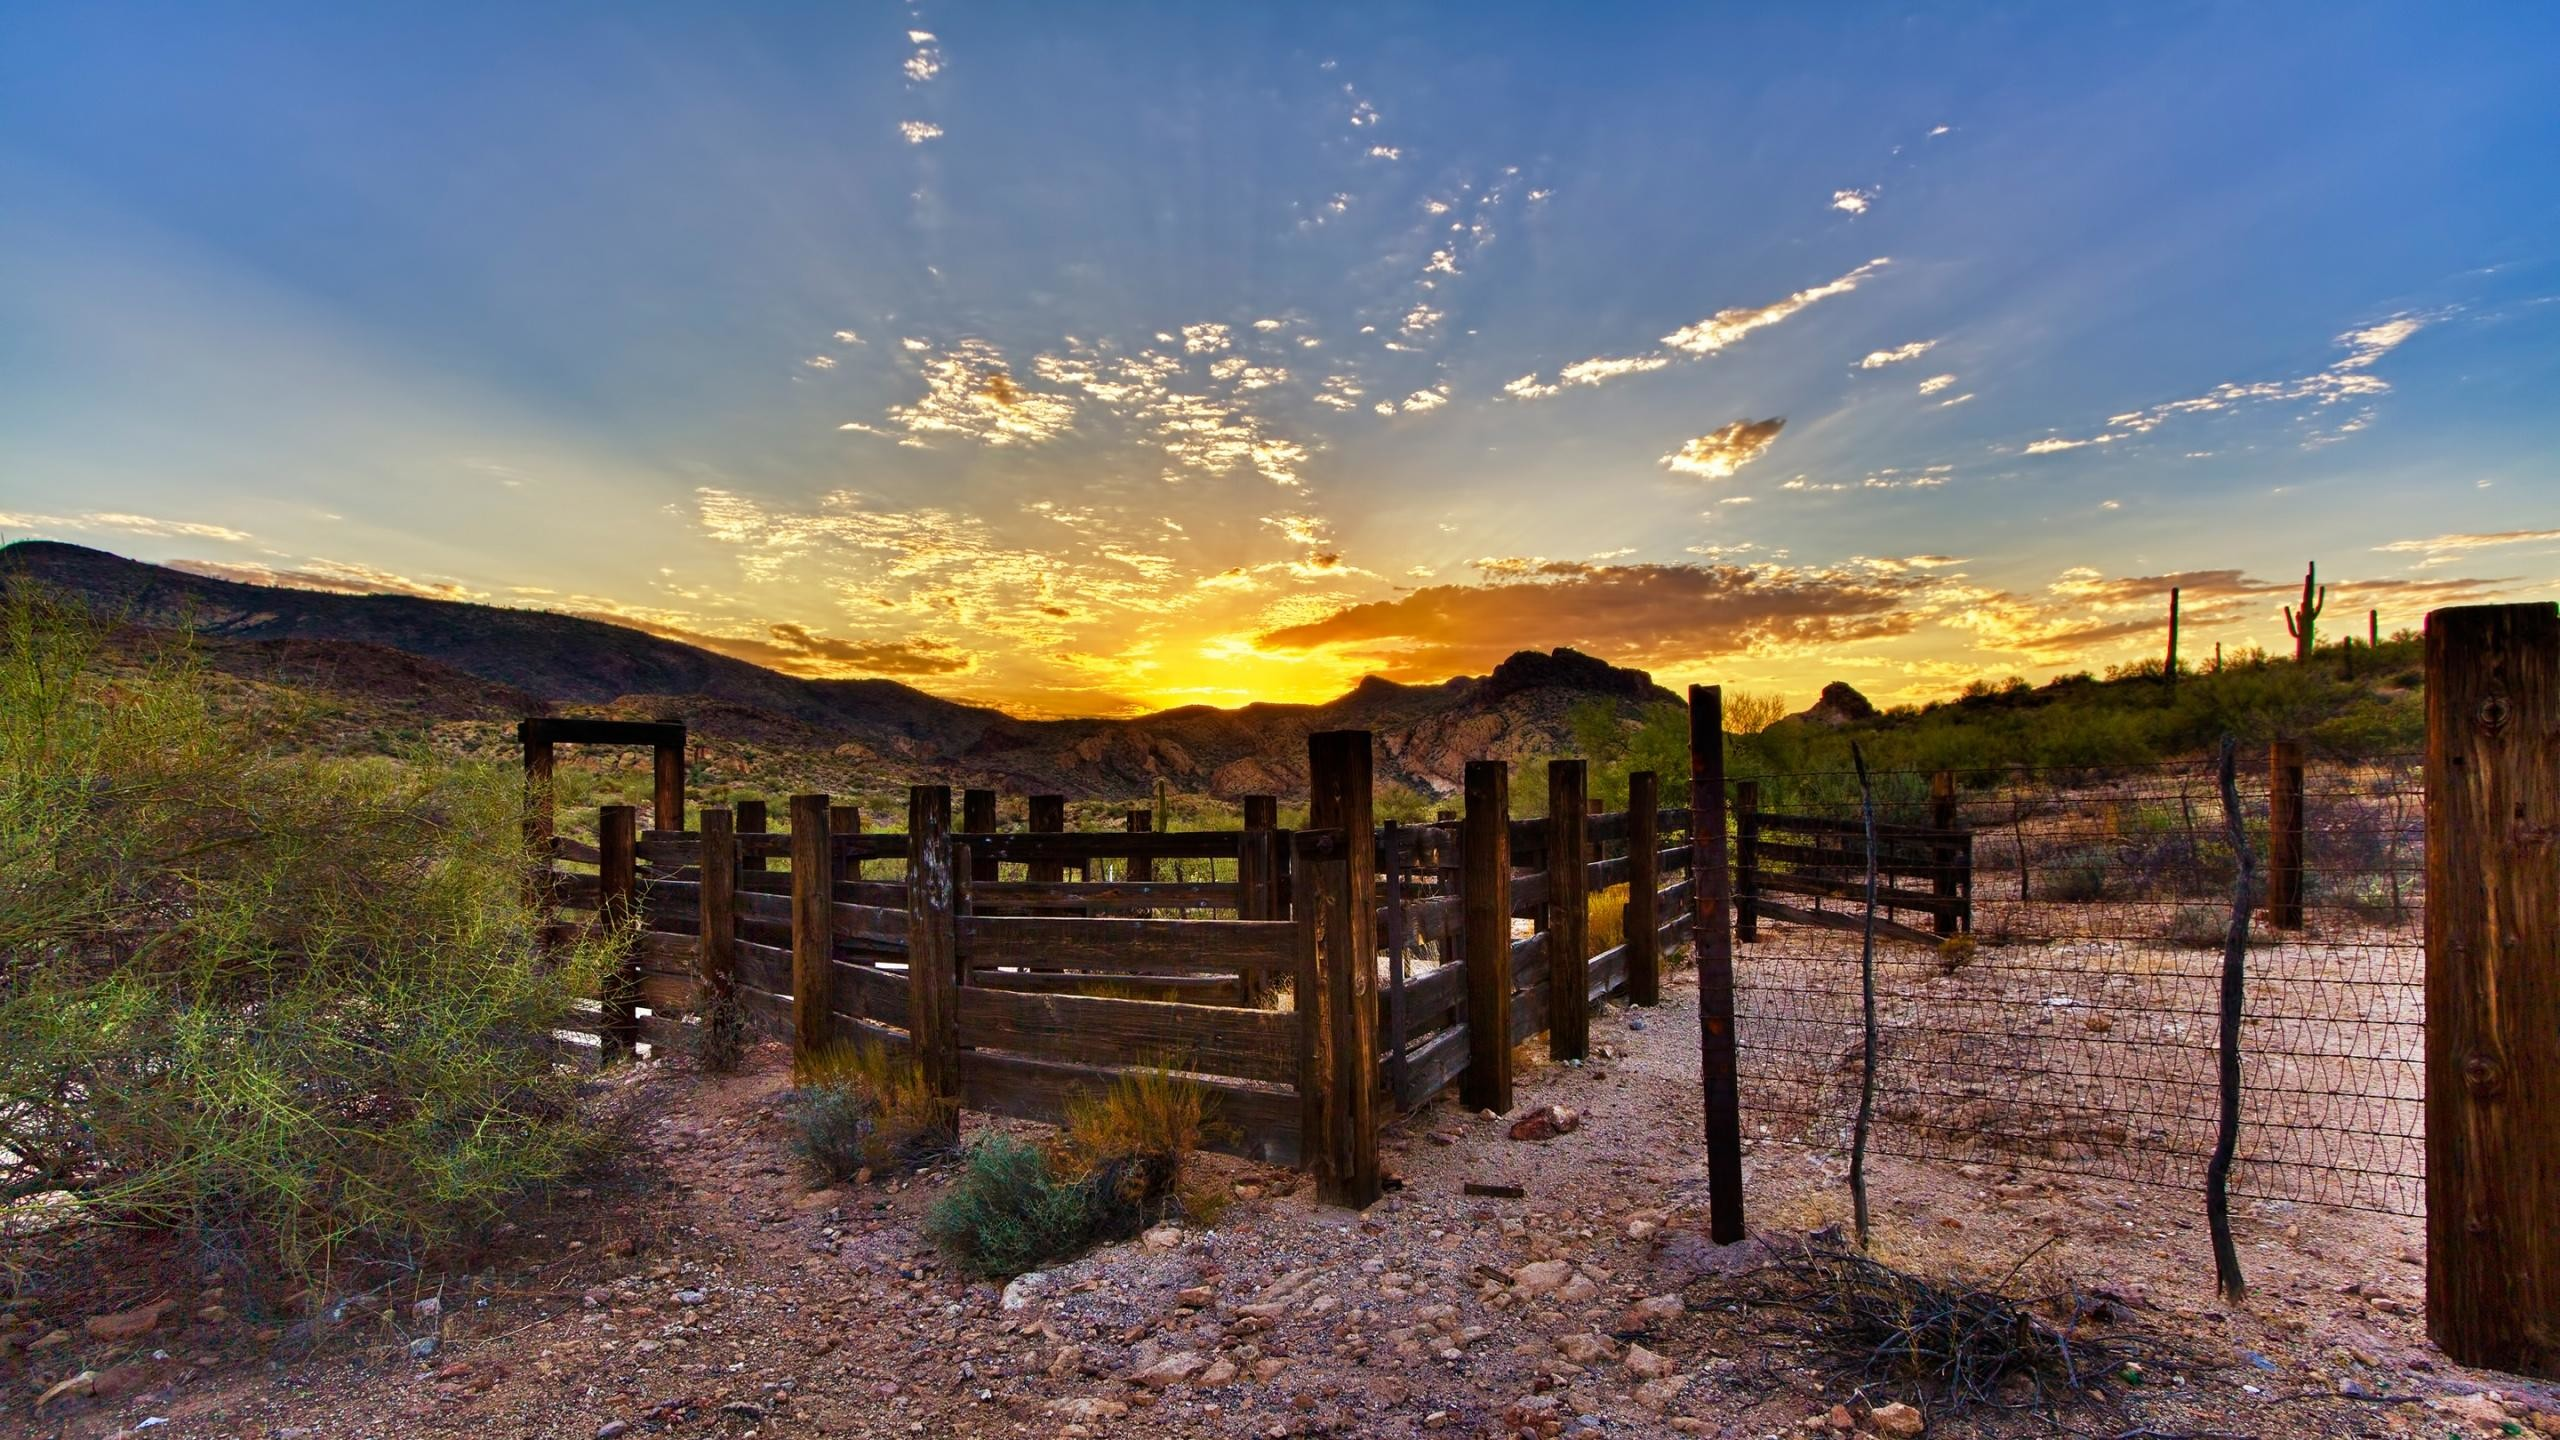 2560x1440 cattle ranch wallpaper - Google Search